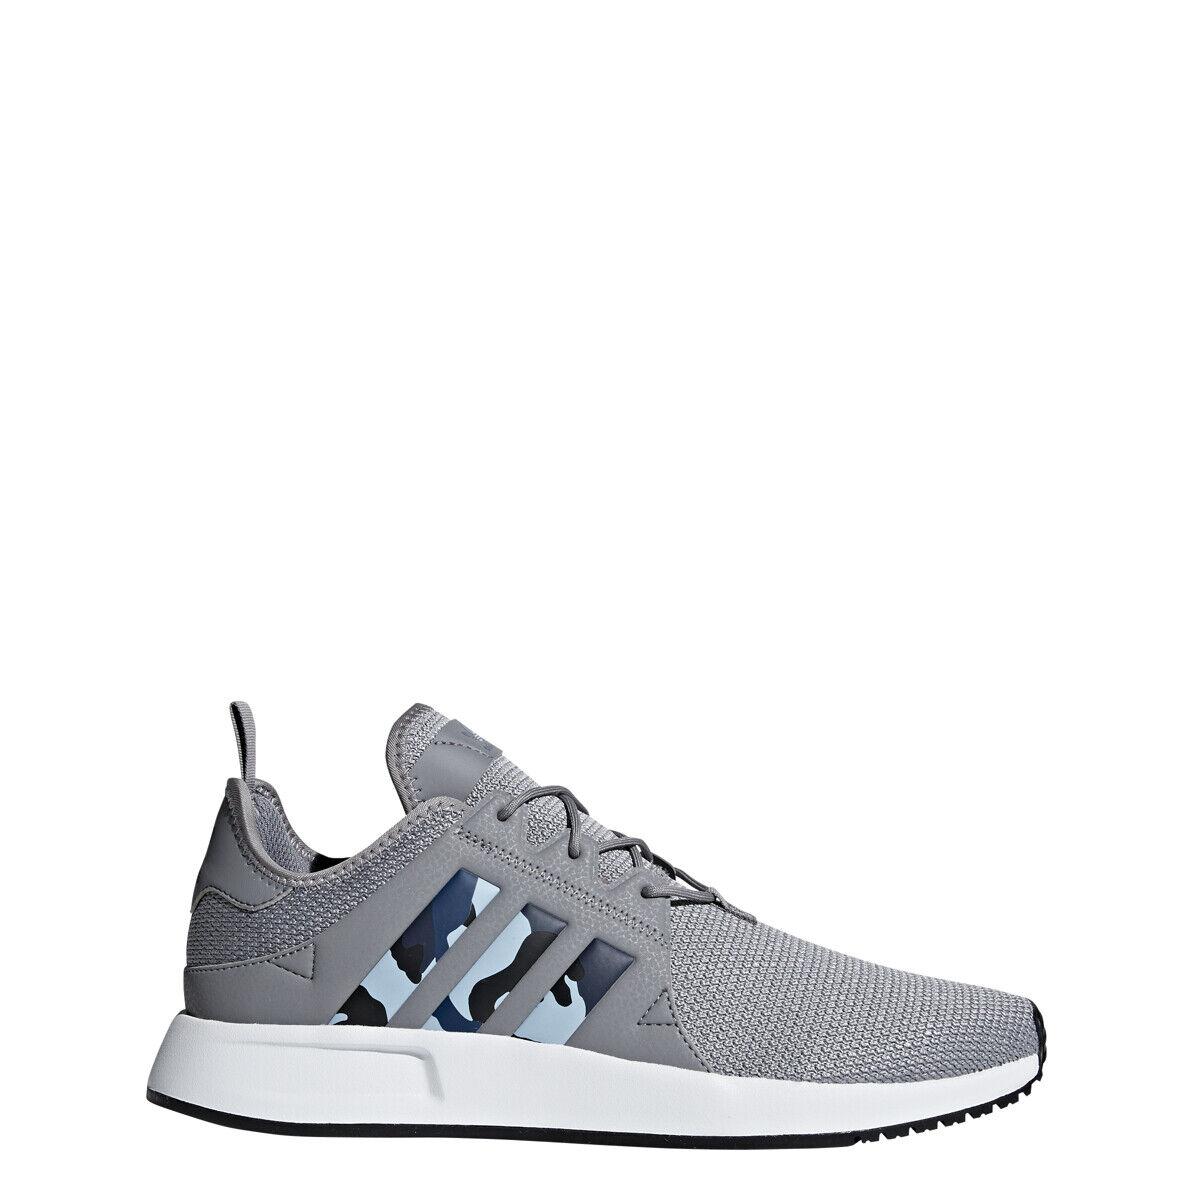 Adidas Mens X_PLR SHOES Grey Grey Black - BD7982